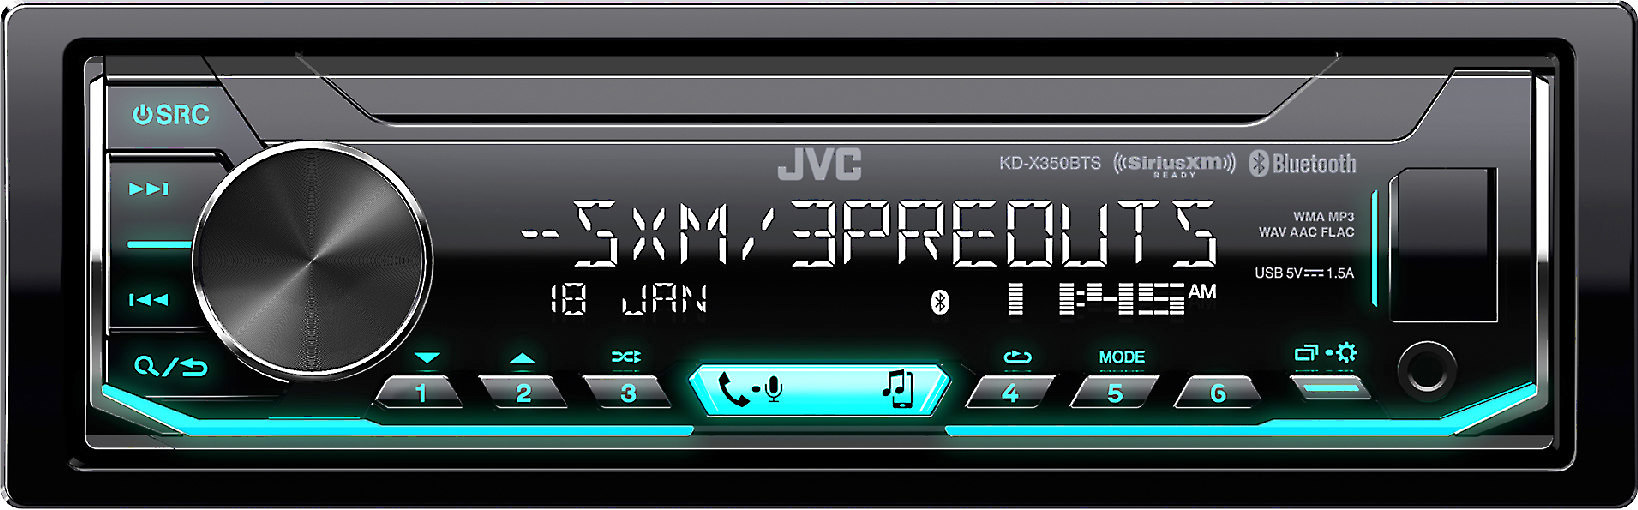 buy cheap 4a3ff be9be JVC KD-X350BTS Digital media receiver (does not play CDs) at Crutchfield.com